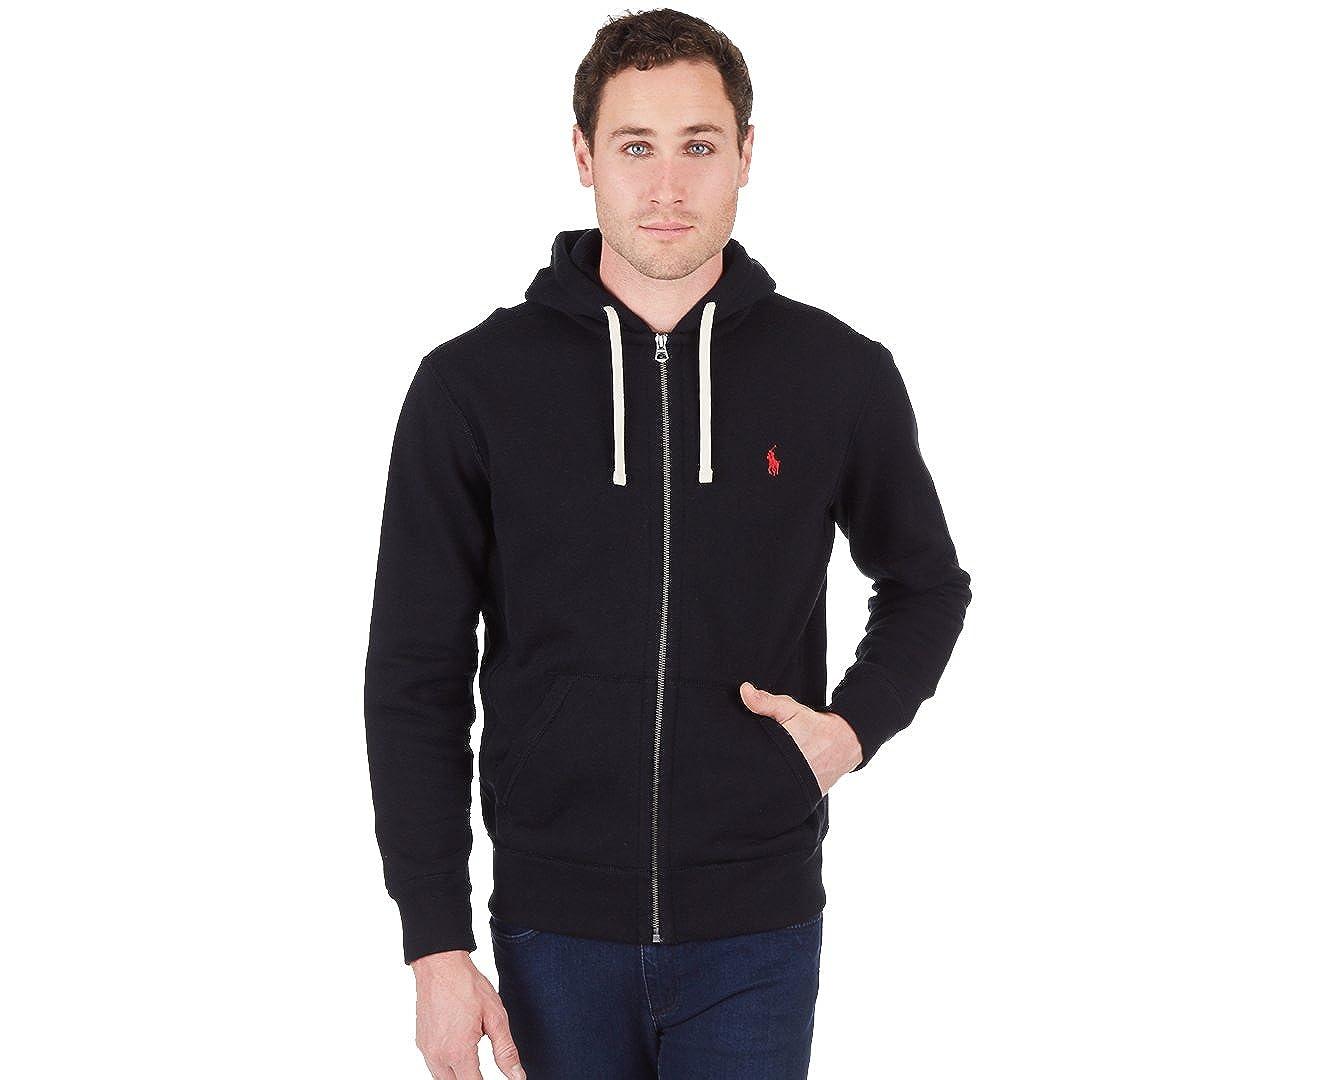 f9728dfb0 Amazon.com  Polo Ralph Lauren Classic Full-Zip Fleece Hooded ...